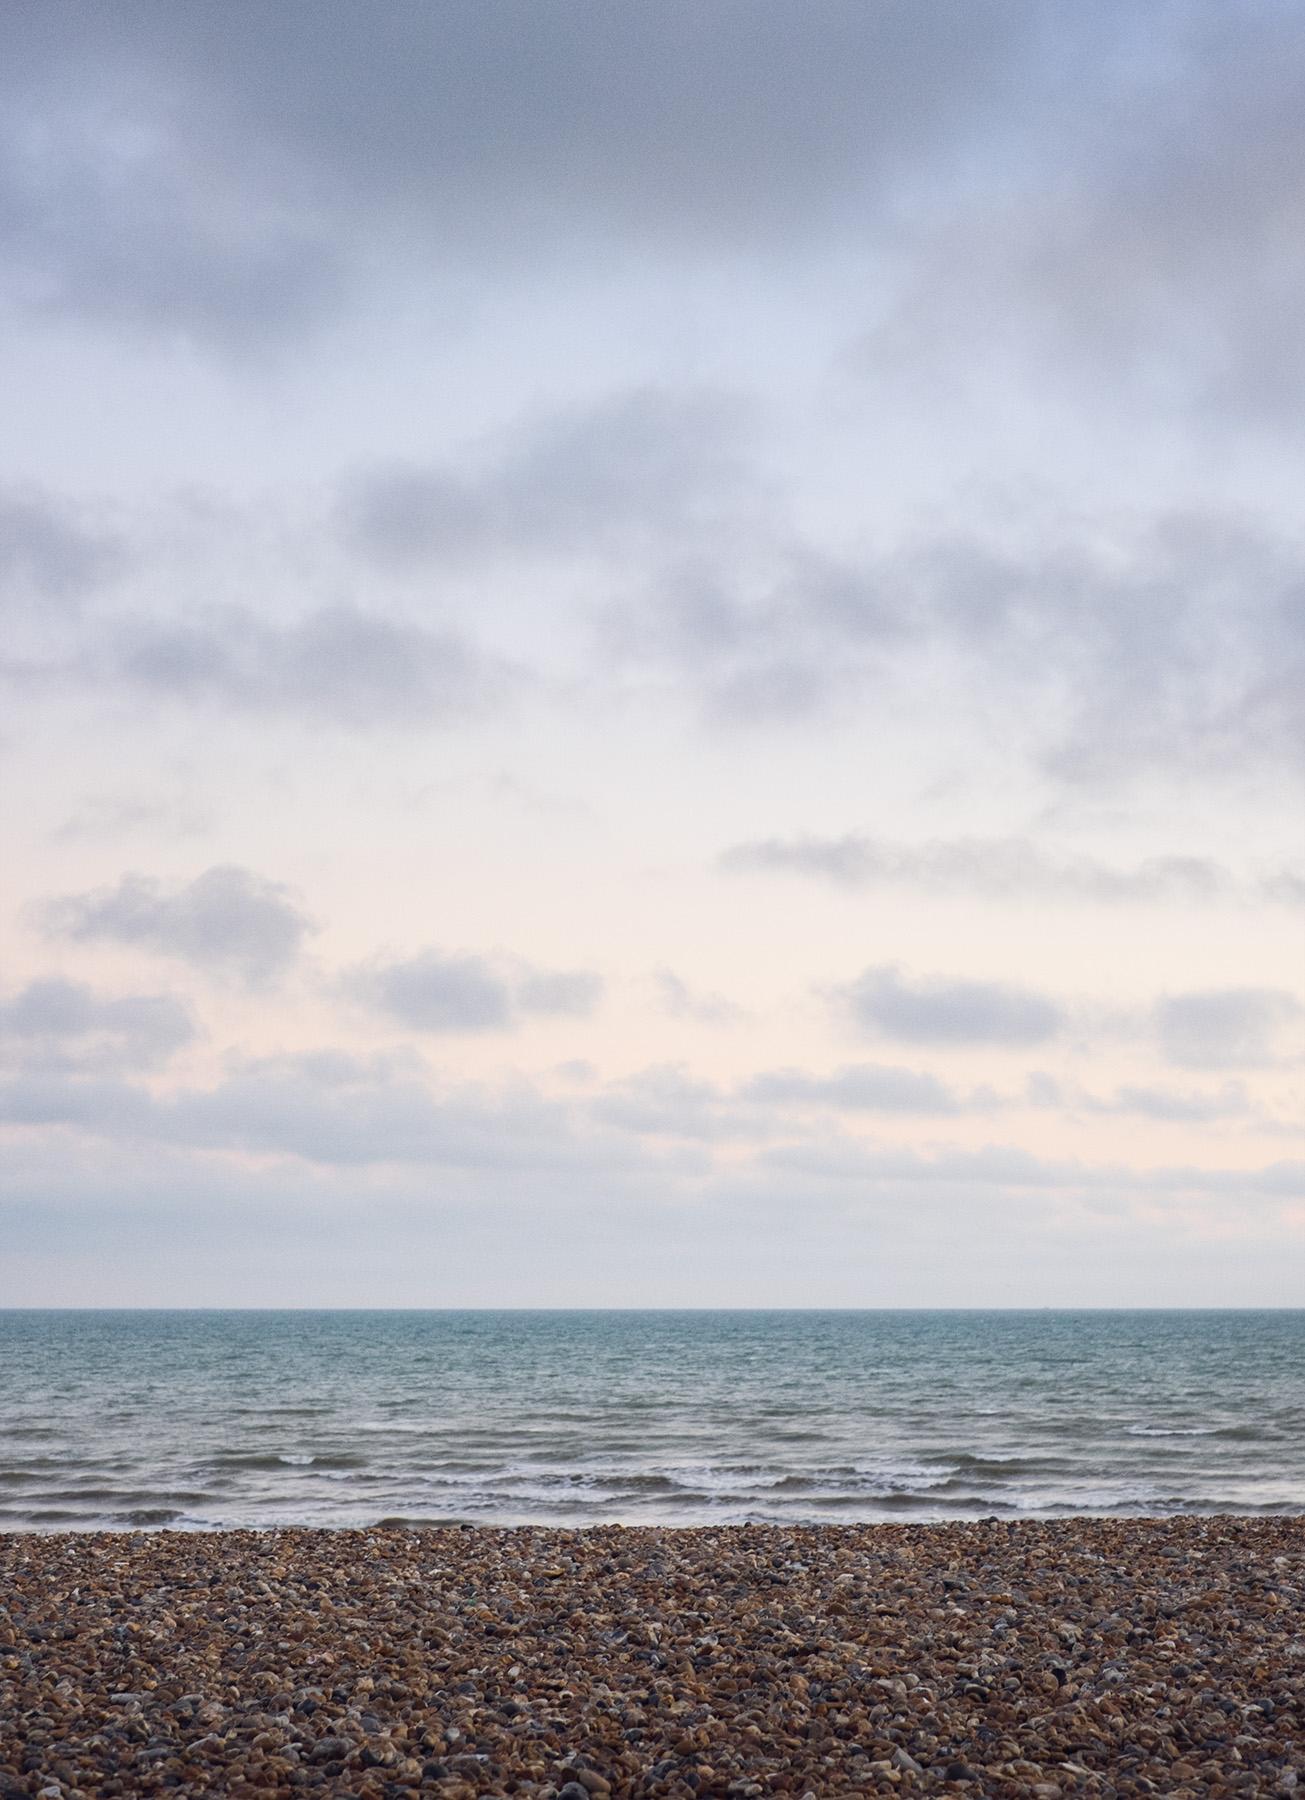 brighton-beach-front